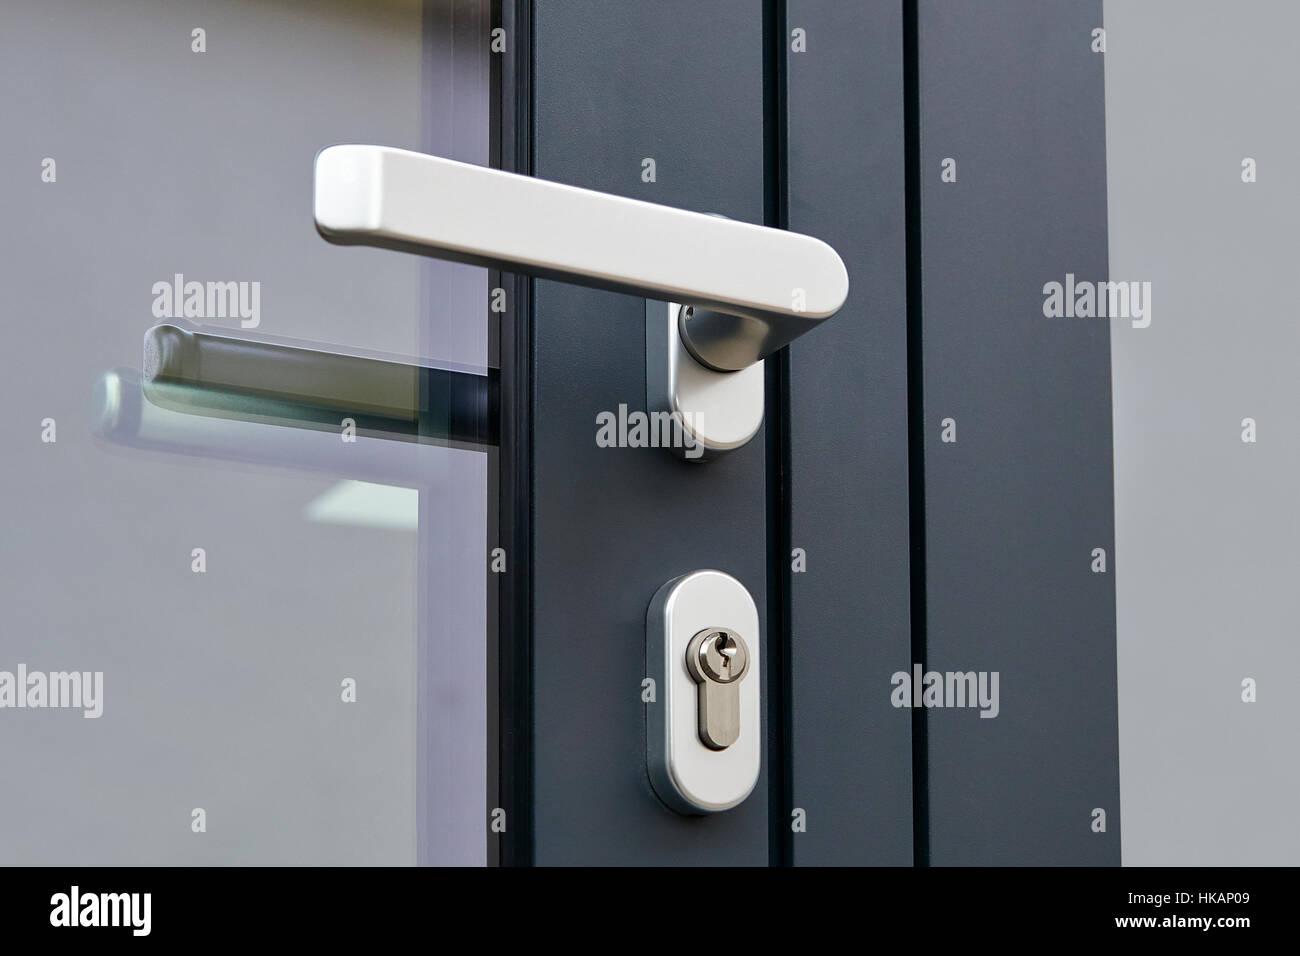 Exterior Door Handle And Security Lock On Metal Frame Stock Photo